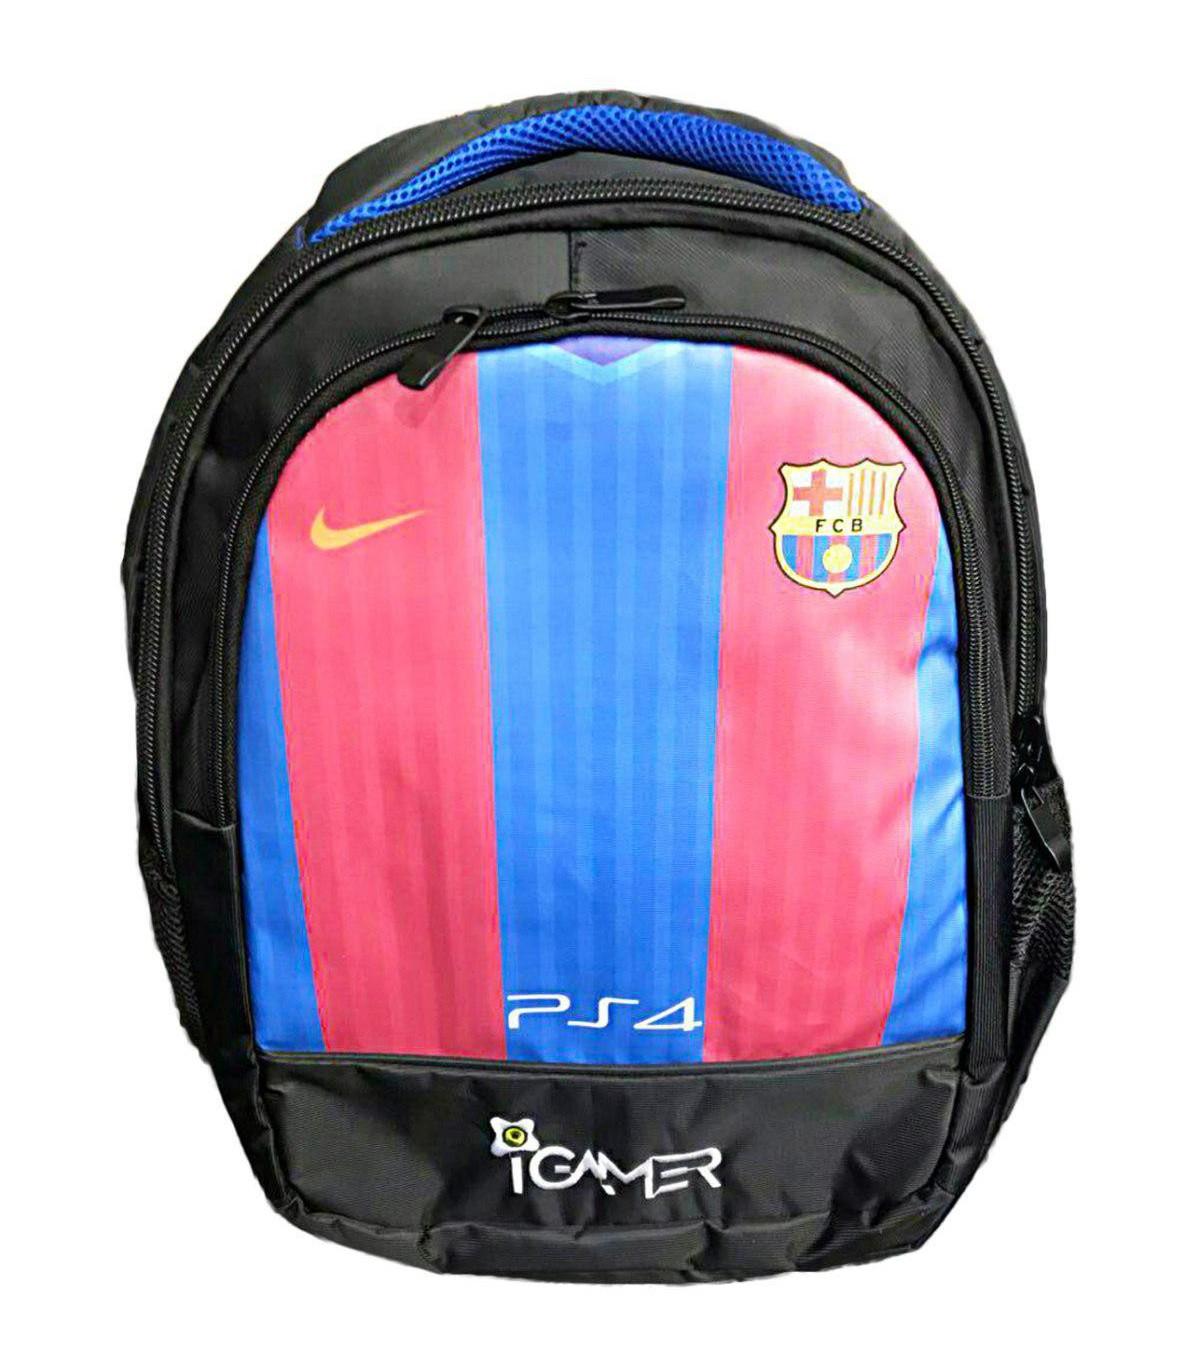 کیف کنسول PS4 آی گیمر مدل کوله پشتی طرح Barcelona